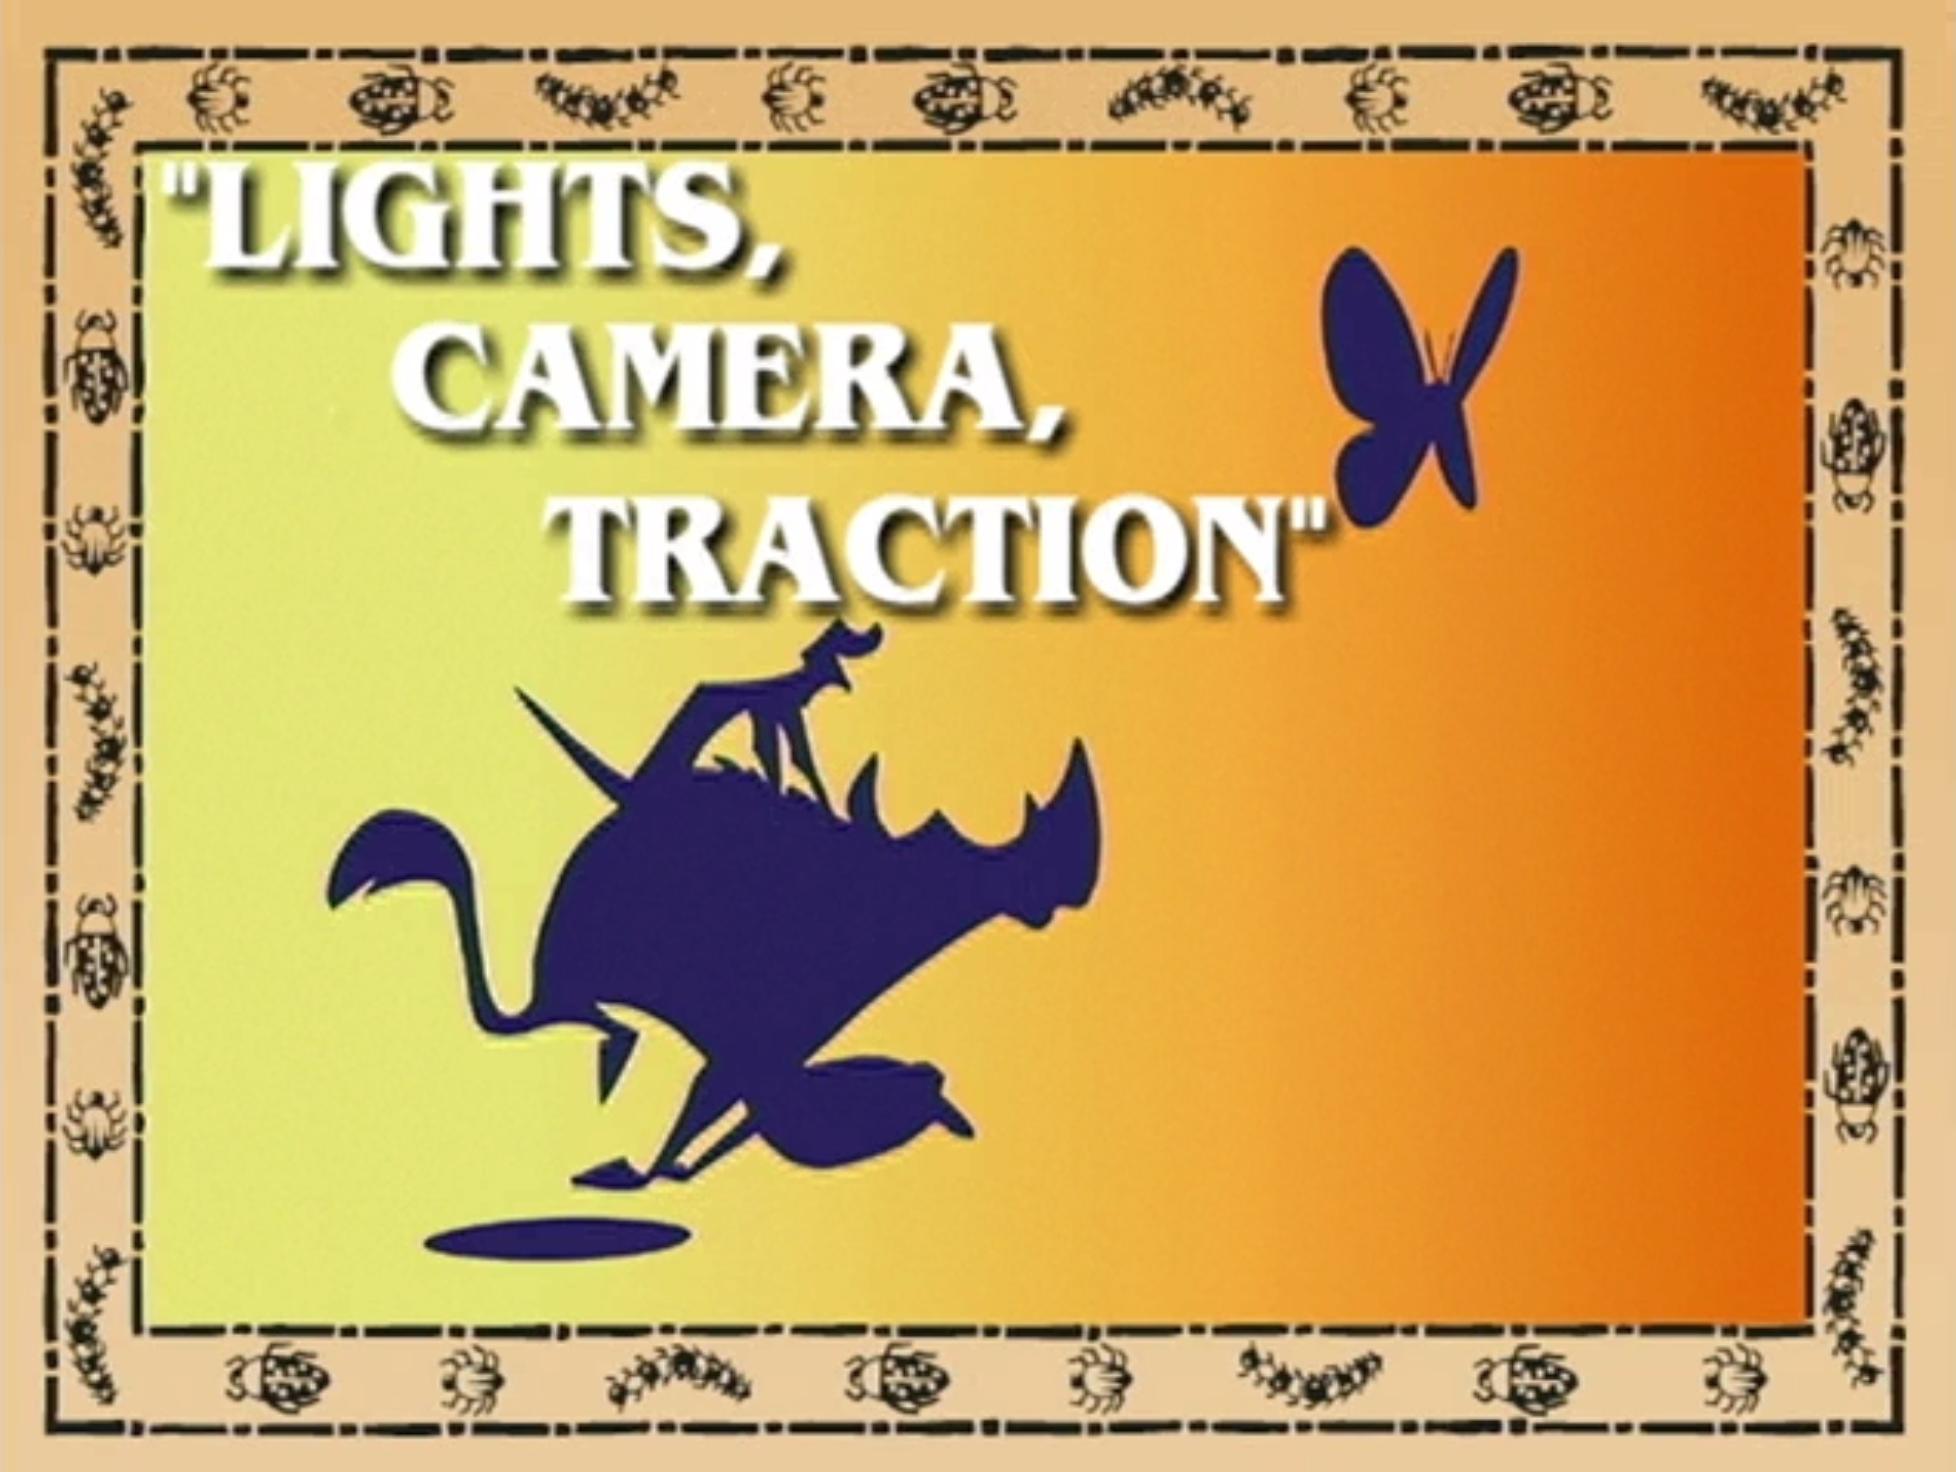 Lights, Camera, Traction